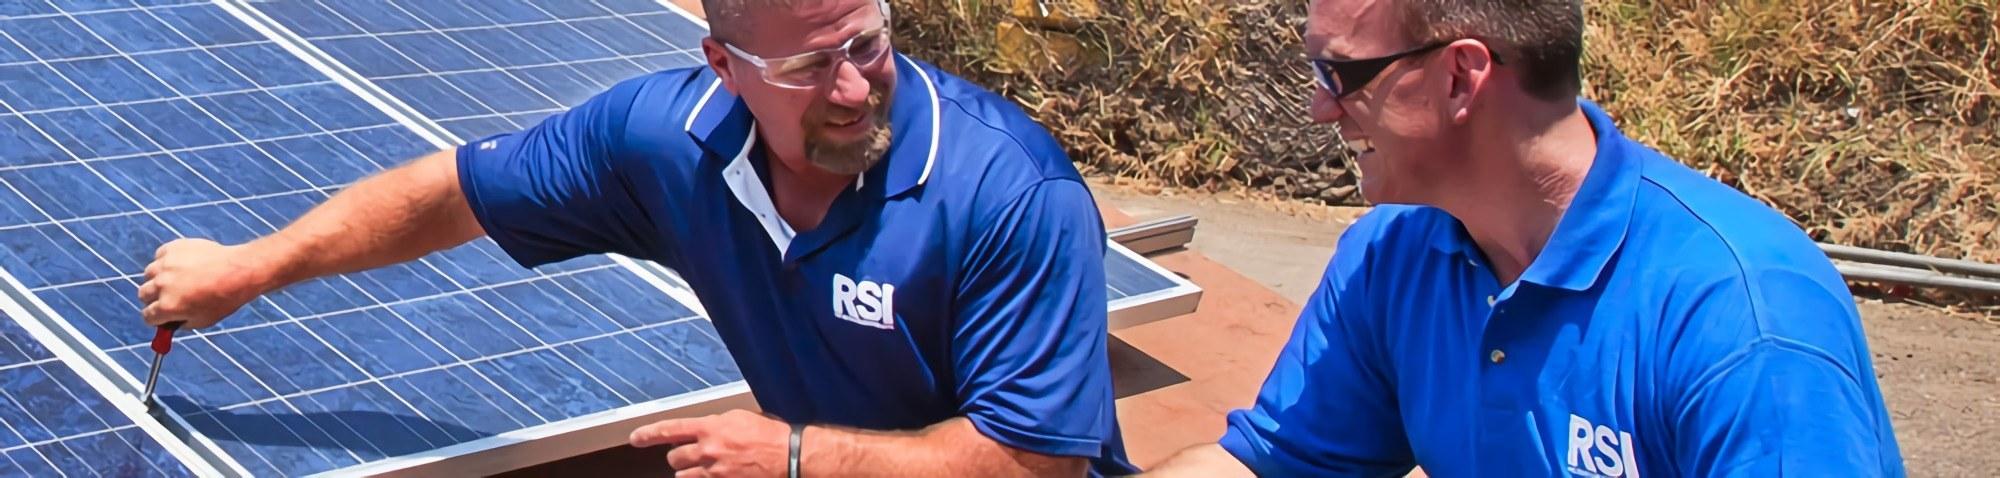 RSI Refrigeration School Training Equipment Solar